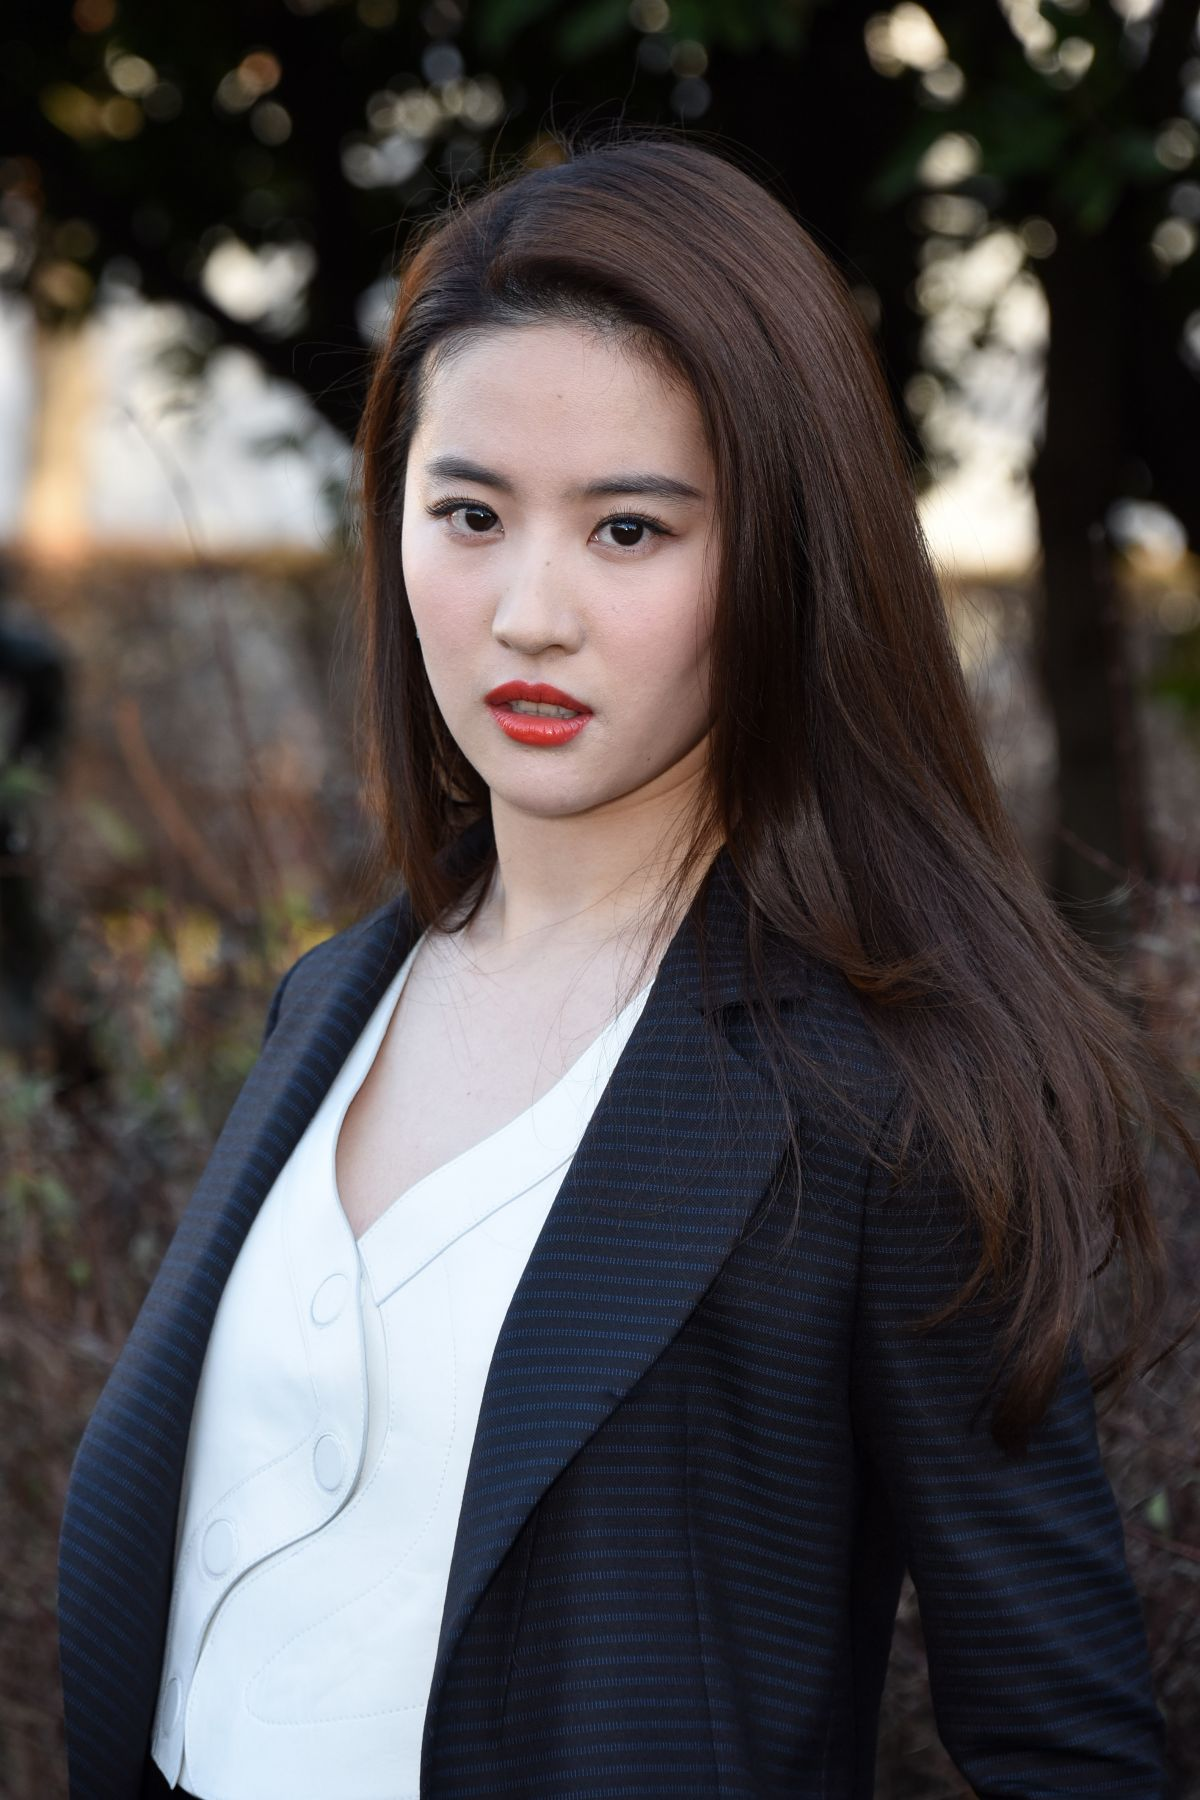 Liu Yifei Net Worth